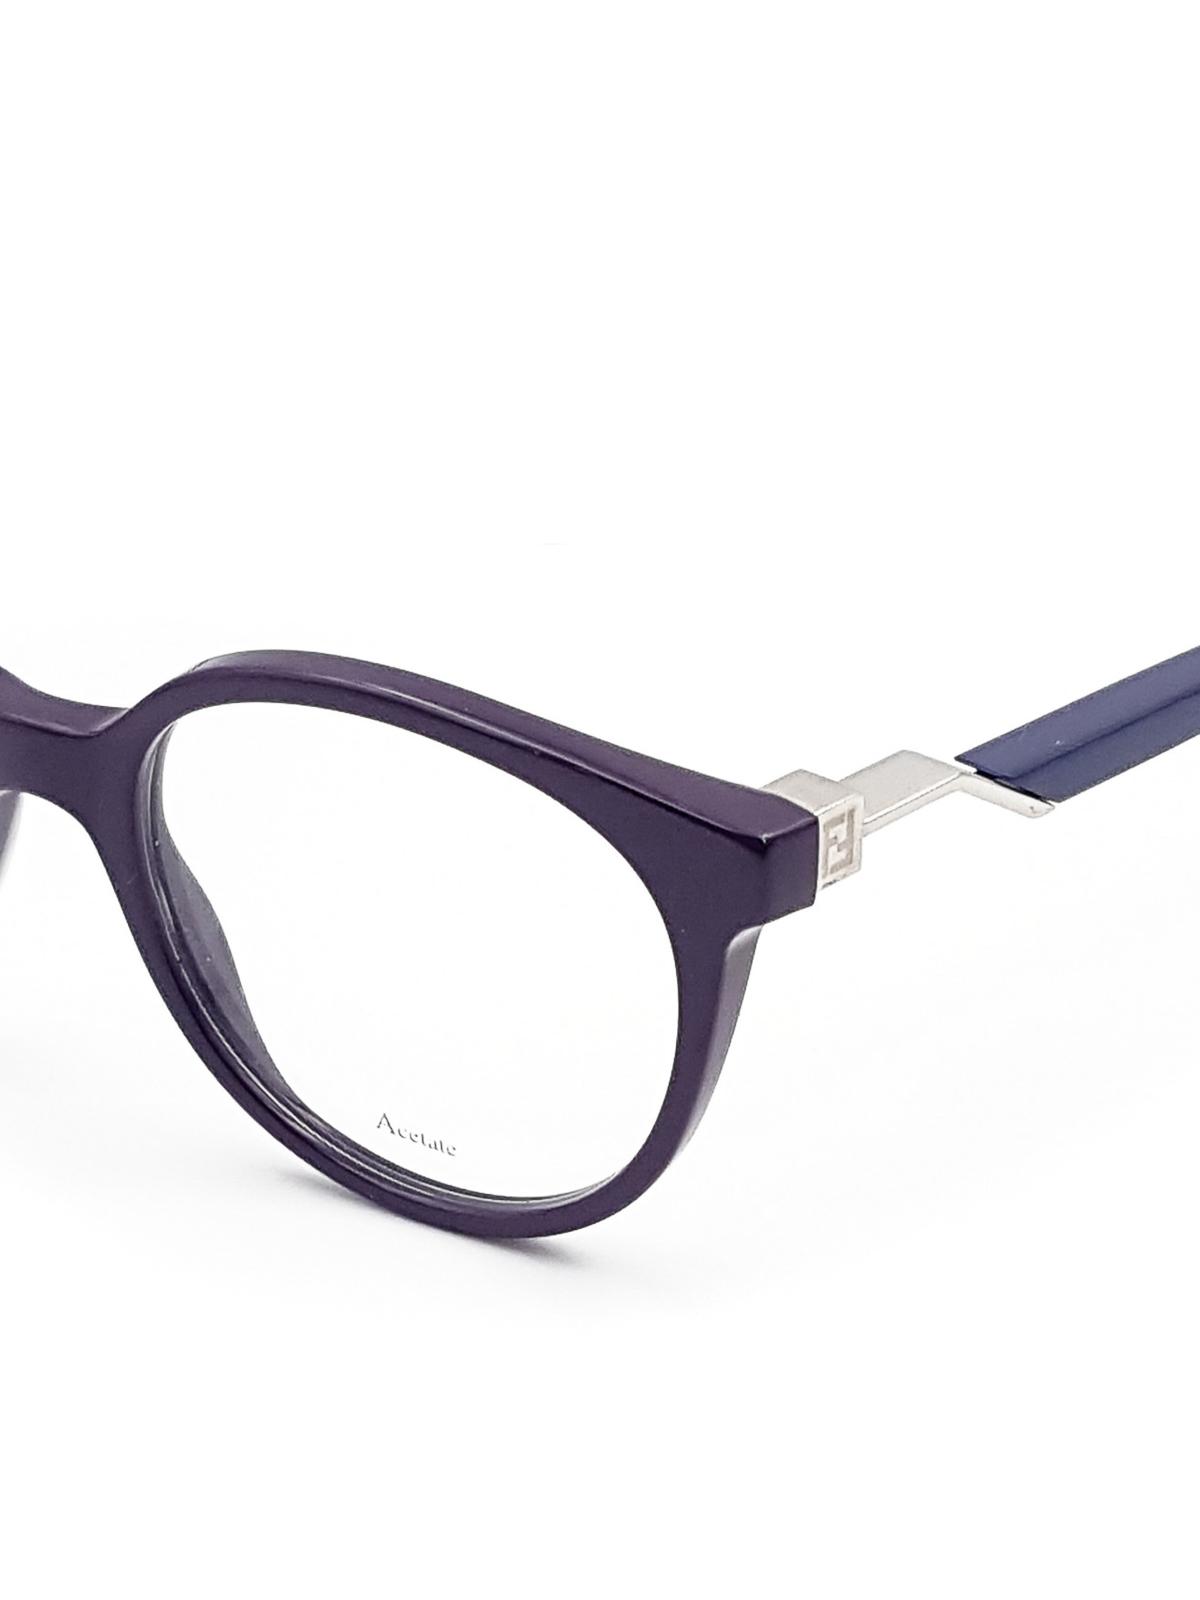 2e2705b9e0bb3 Fendi Cat Eye Sunglasses Purple